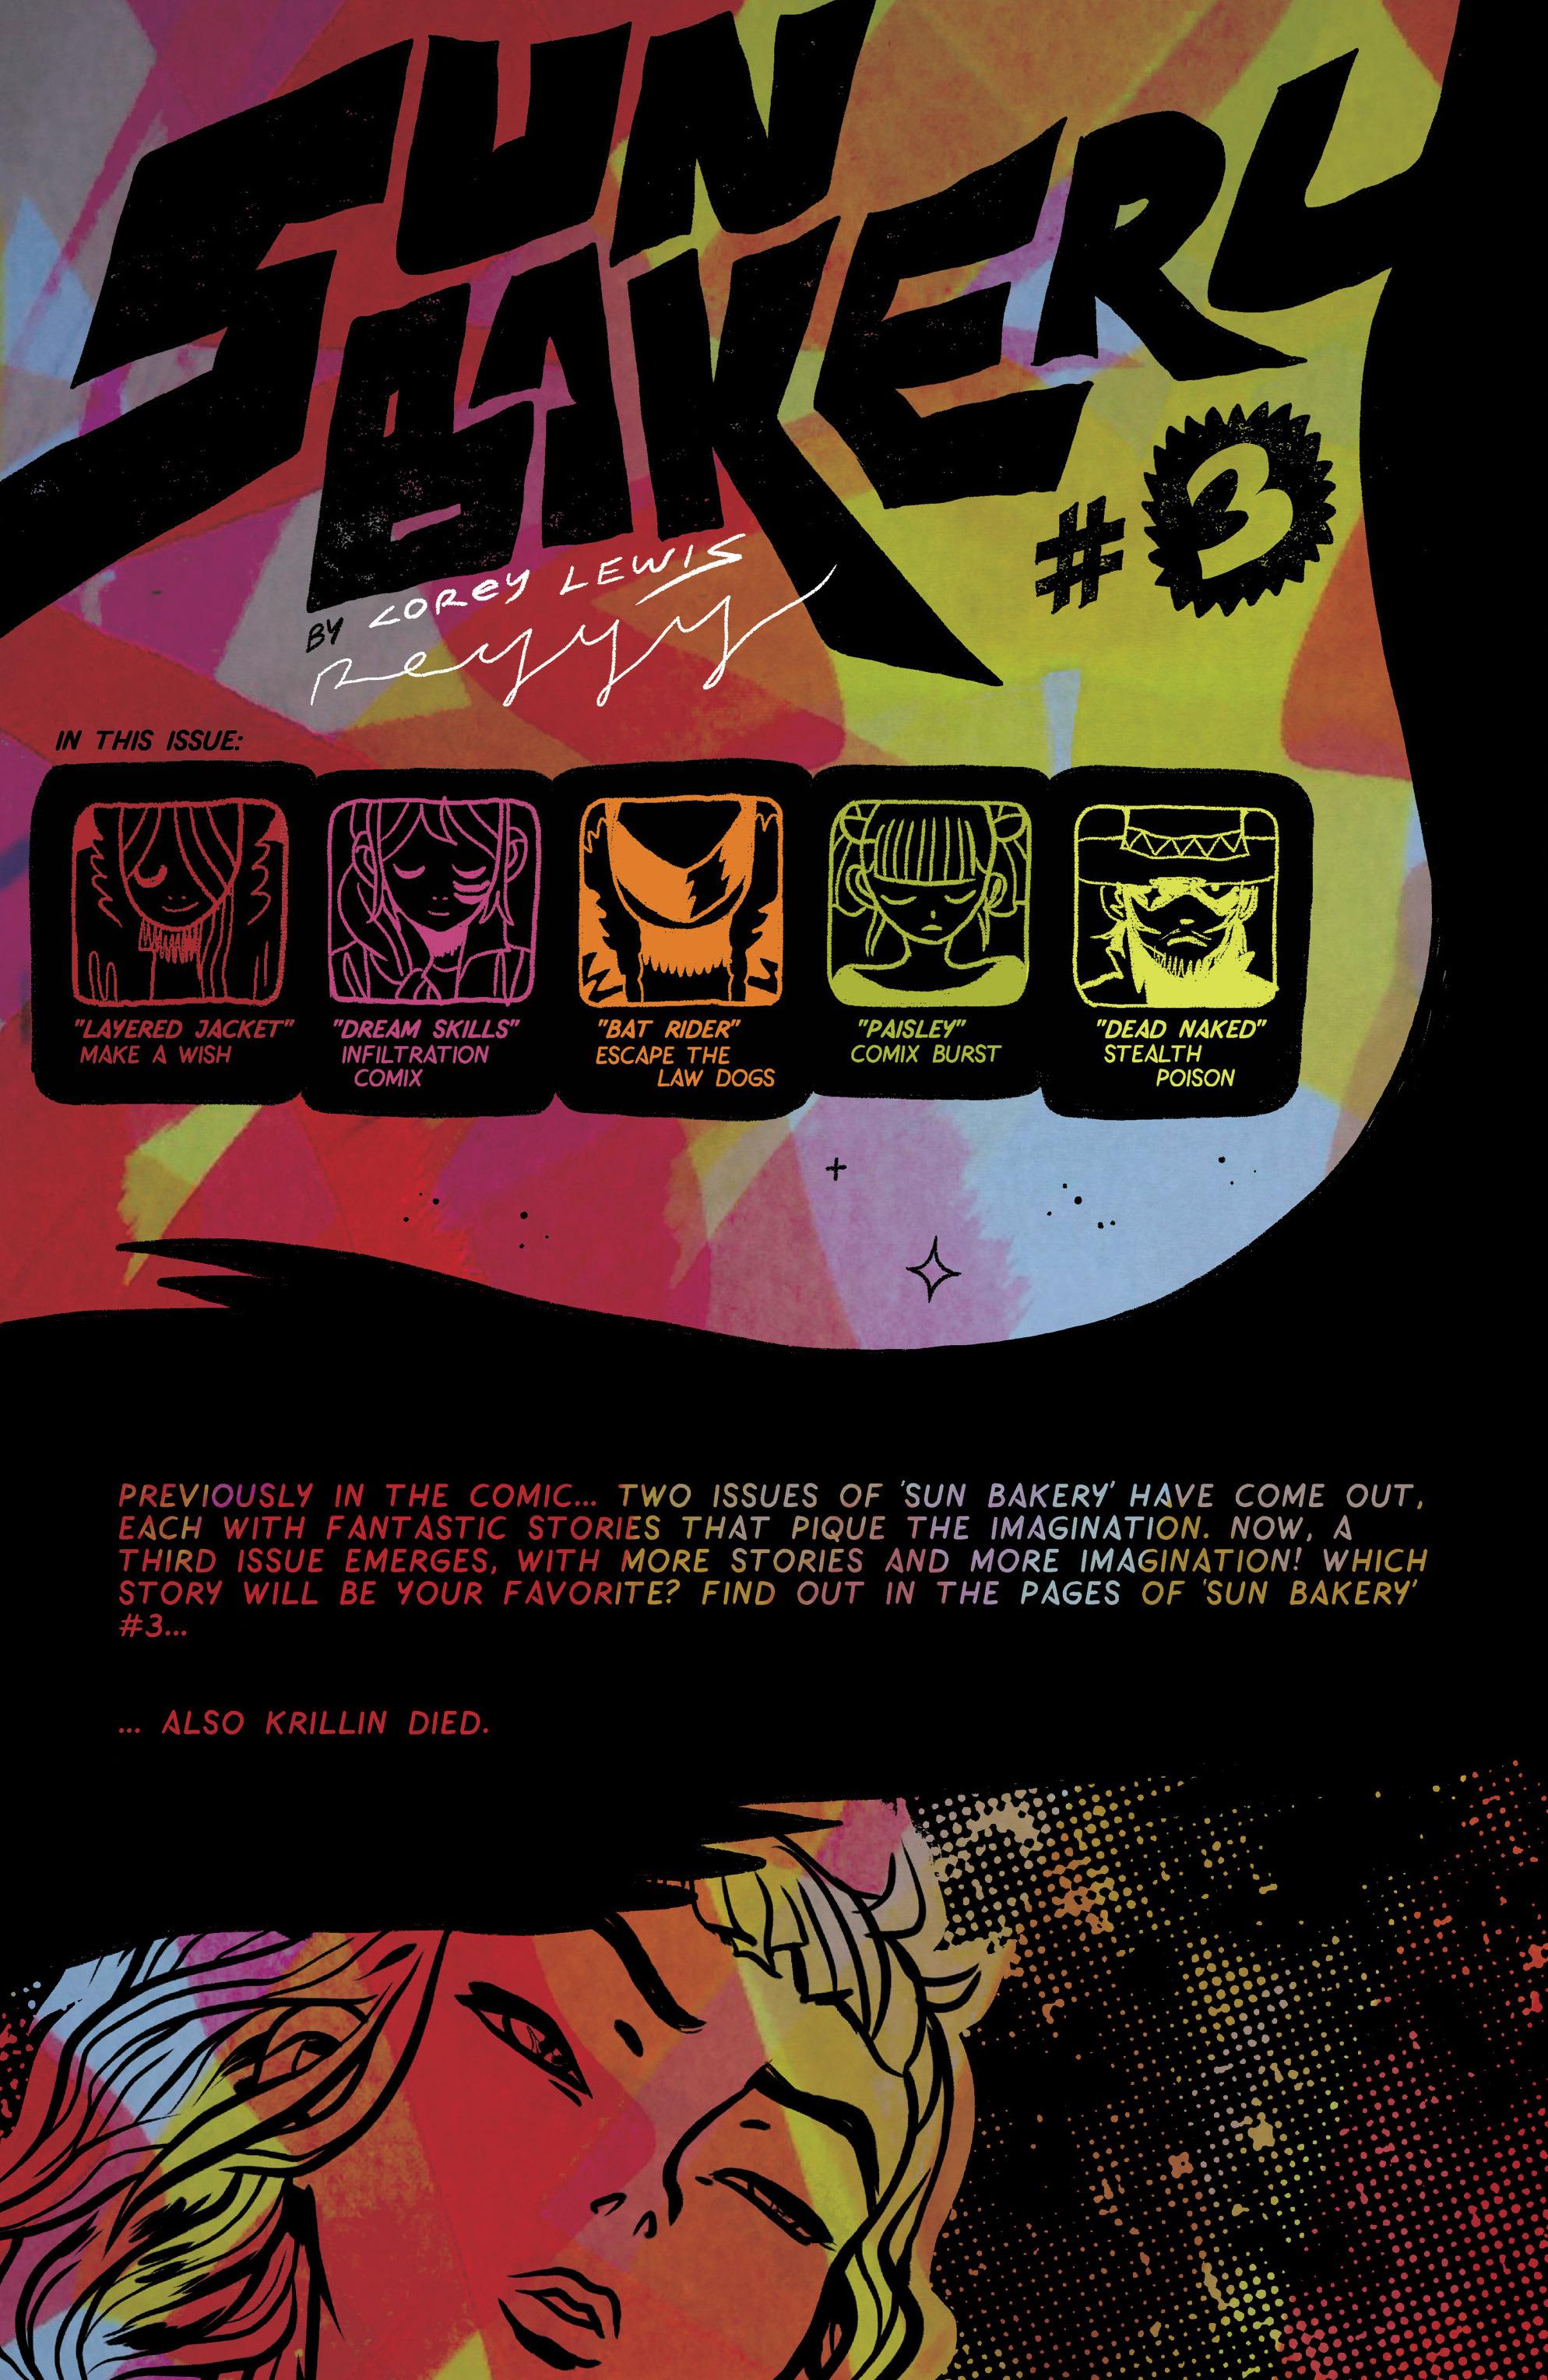 Read online Sun Bakery comic -  Issue #3 - 2